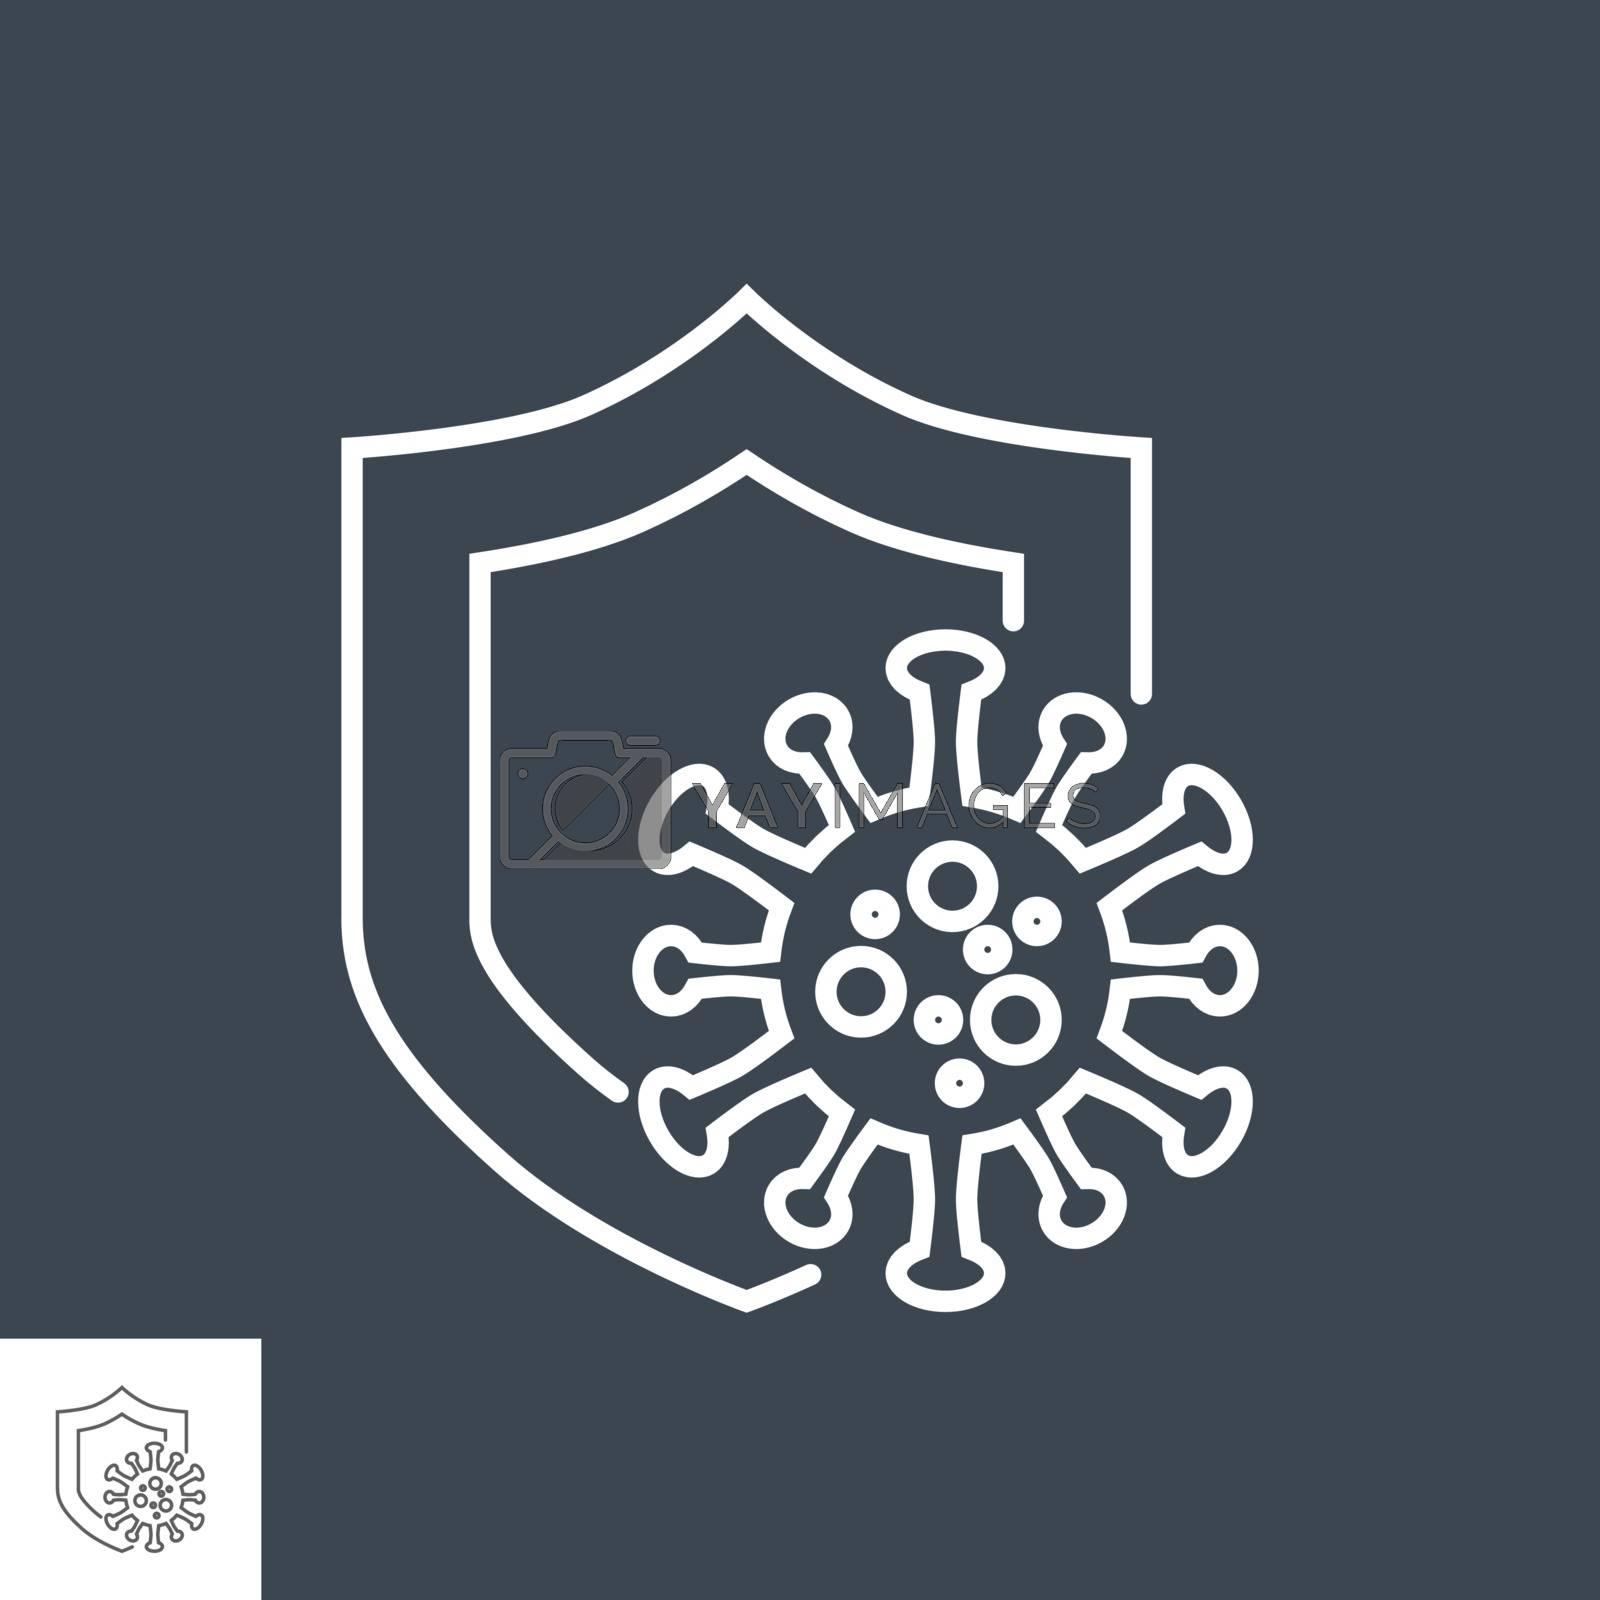 Coronavirus Protection related vector thin line icon. Shield protects against coronavirus. Isolated on black background. Editable stroke. Vector illustration.